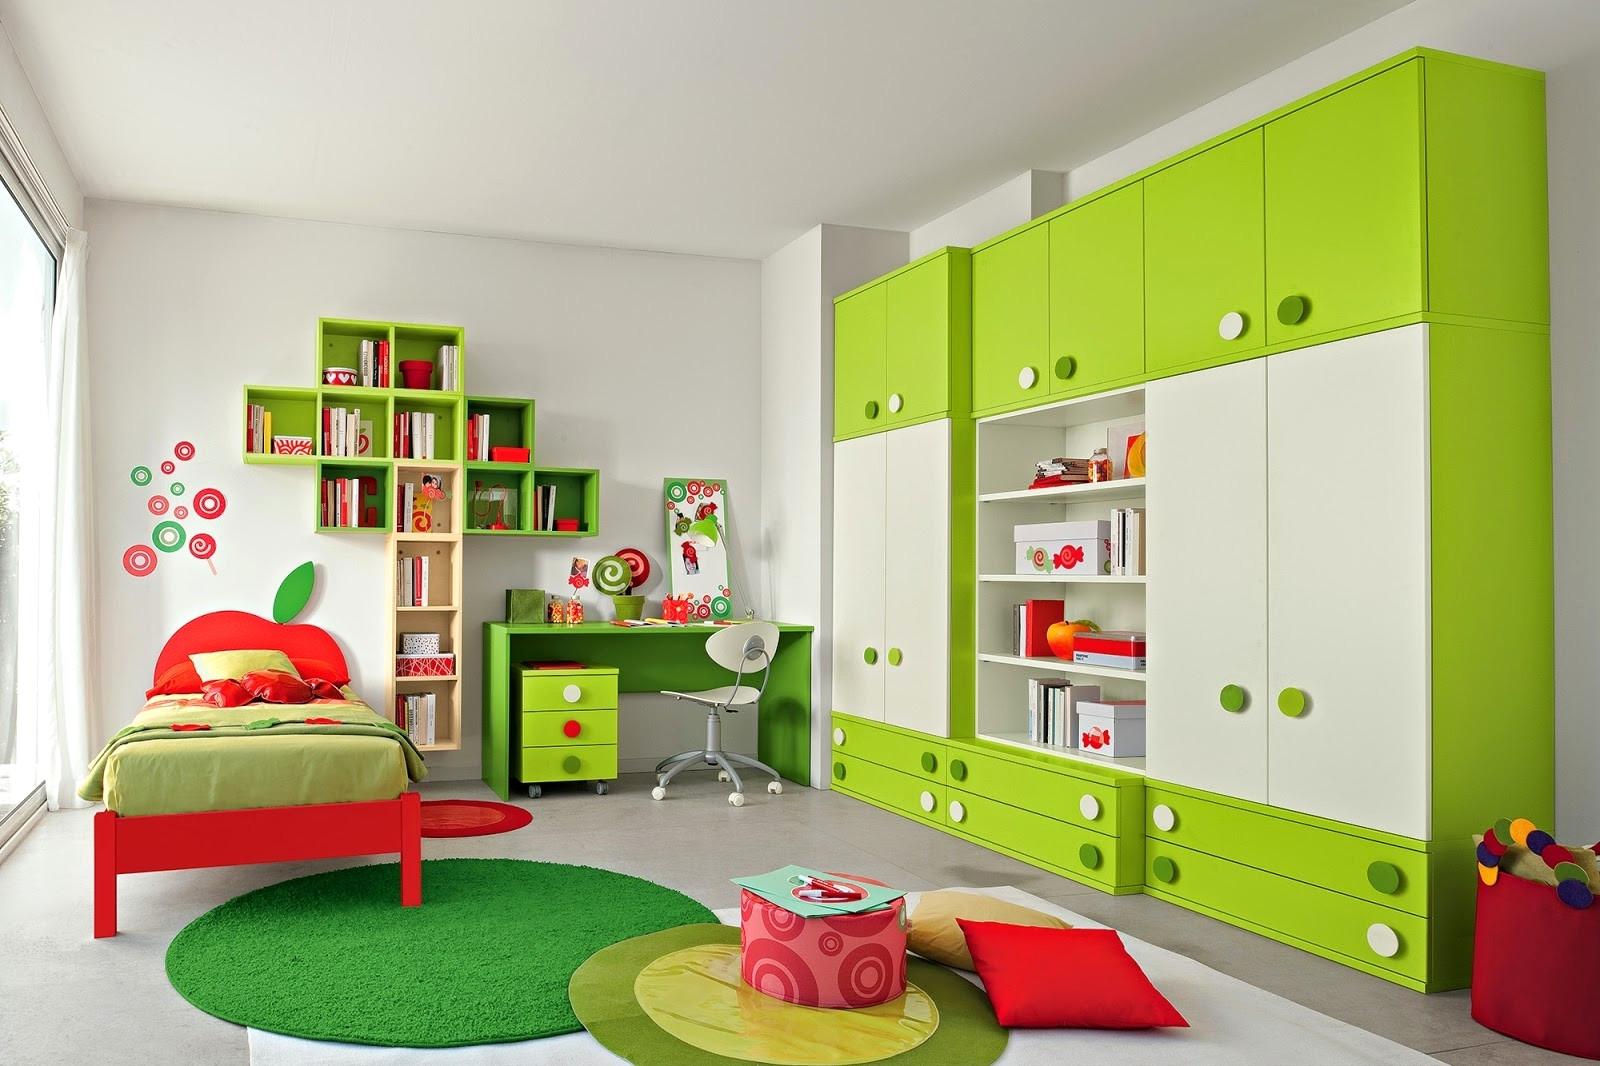 بالصور غرف نوم للاطفال , احدث ديكورات غرف اطفال 4573 11